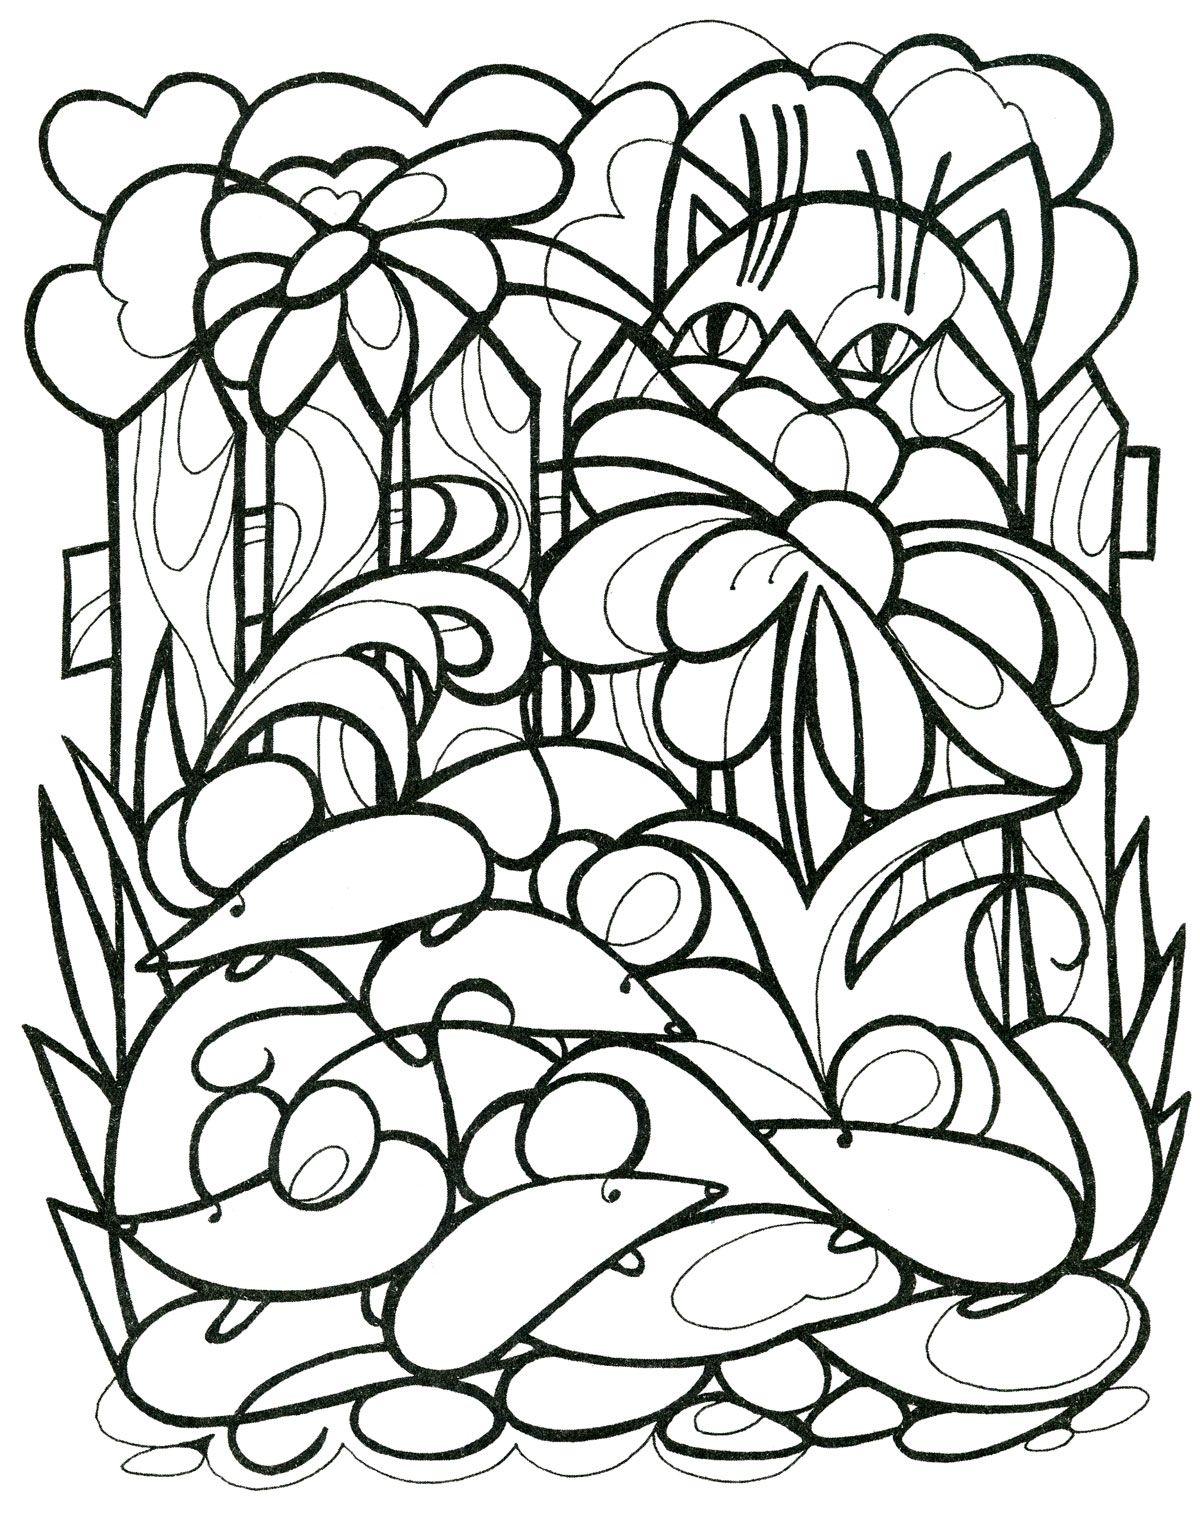 f rbung mit bungen f r kinder ab 3 jahren coloring pages pinterest paper clip and clip art. Black Bedroom Furniture Sets. Home Design Ideas